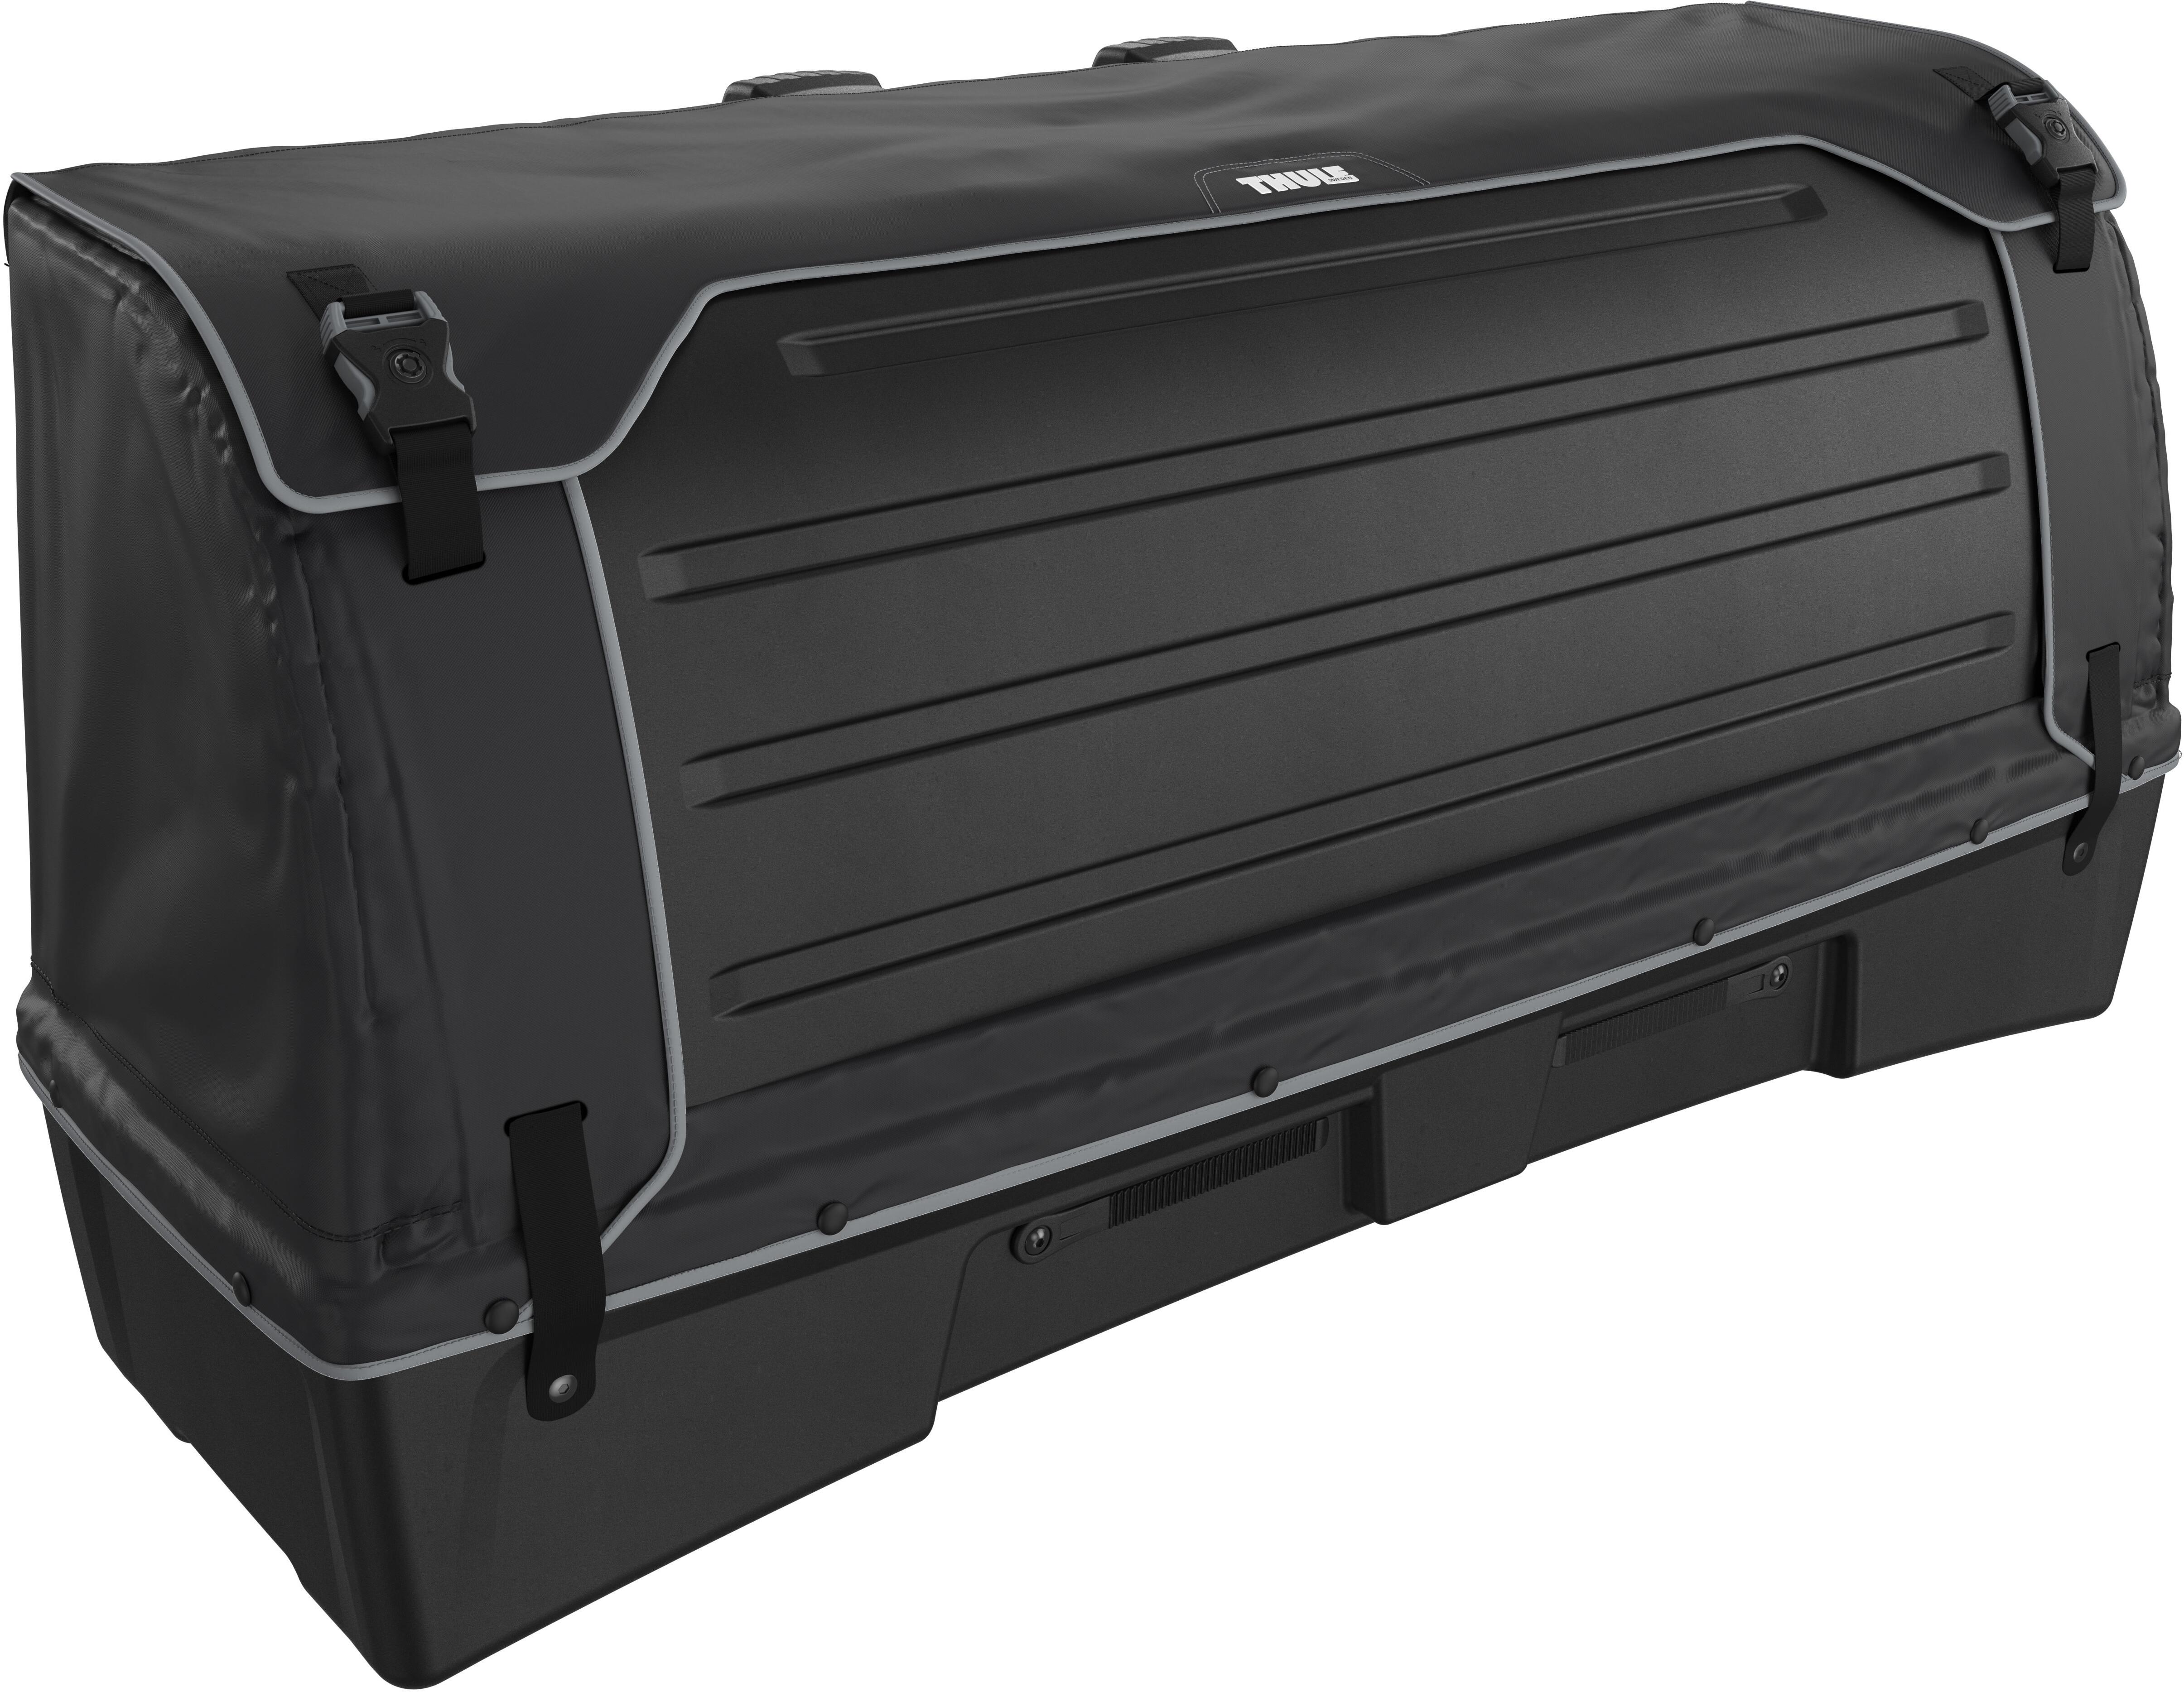 Klettergurt Gelbox : Thule backspace xt cargo box campz.ch